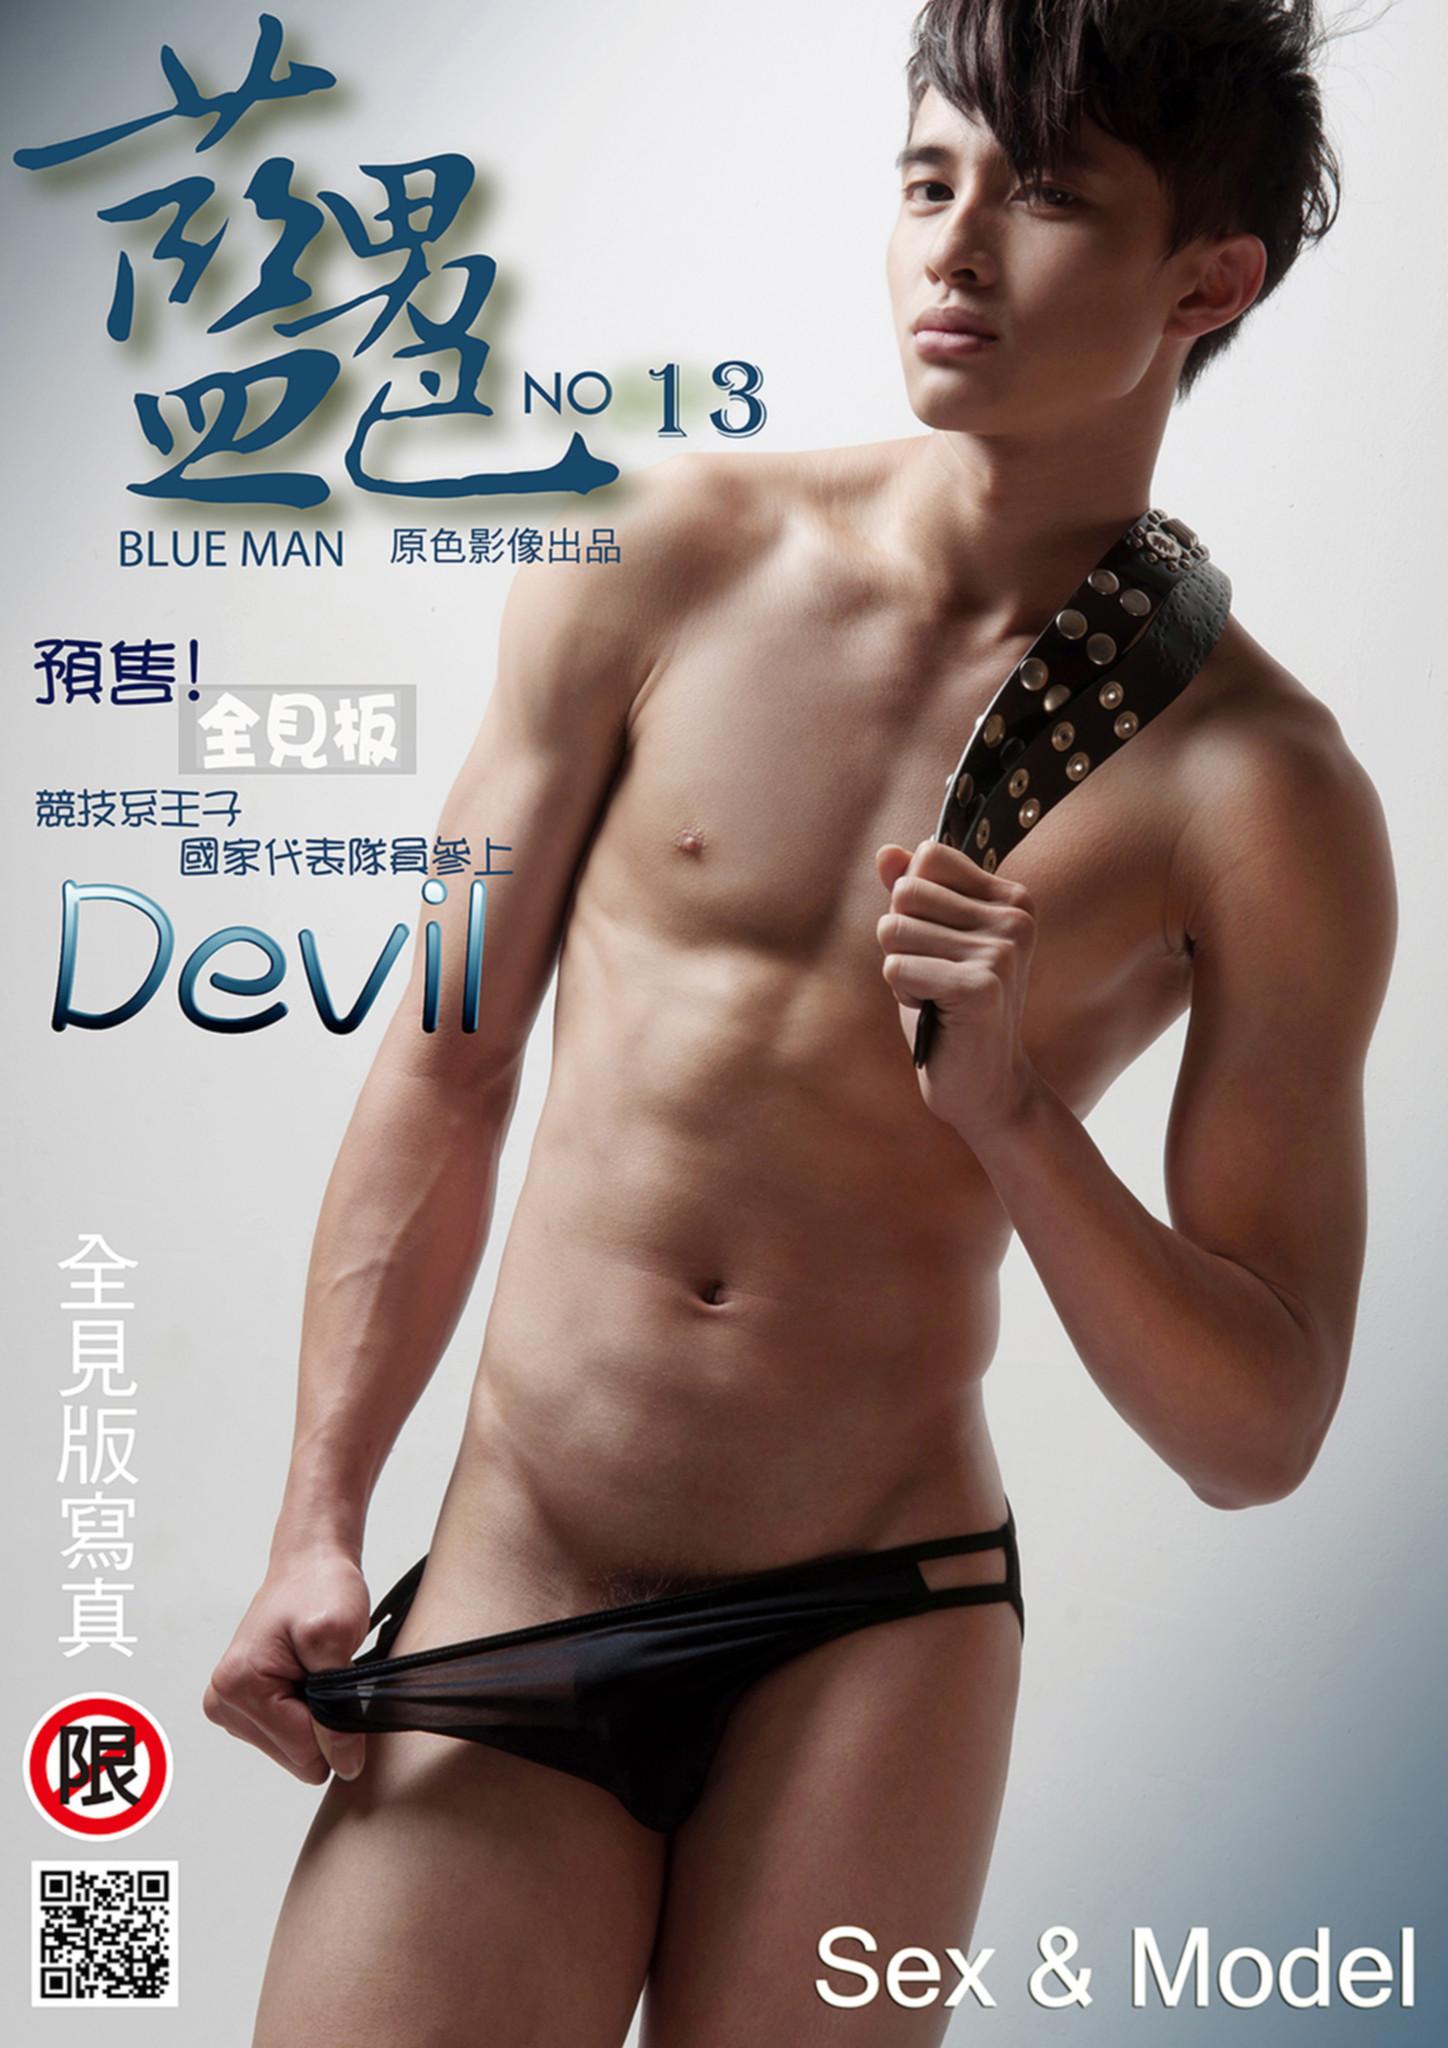 Blue Man #13